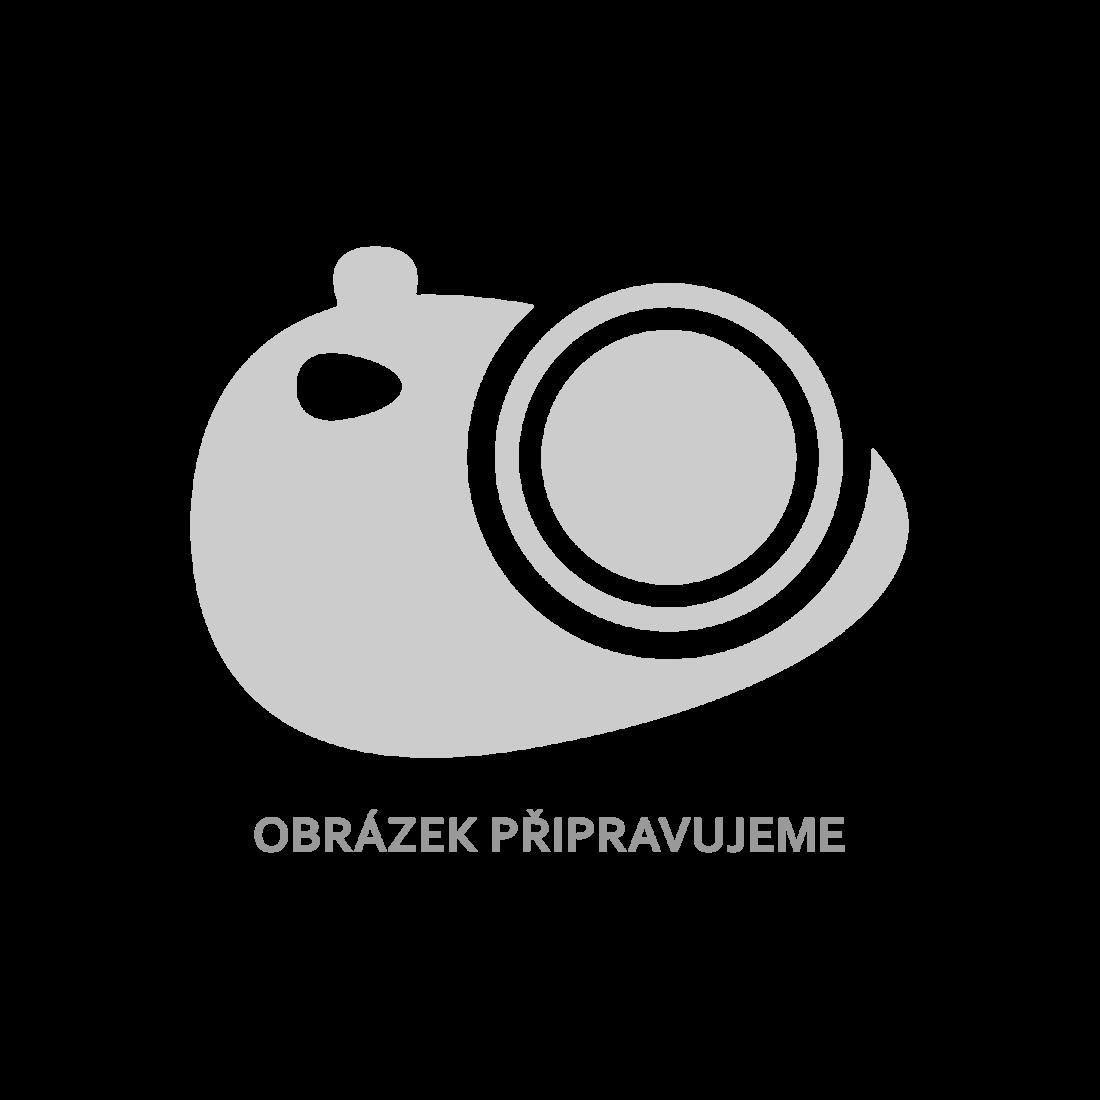 vidaXL Knihovna betonově šedá 98 x 30 x 98 cm dřevotříska [801129]